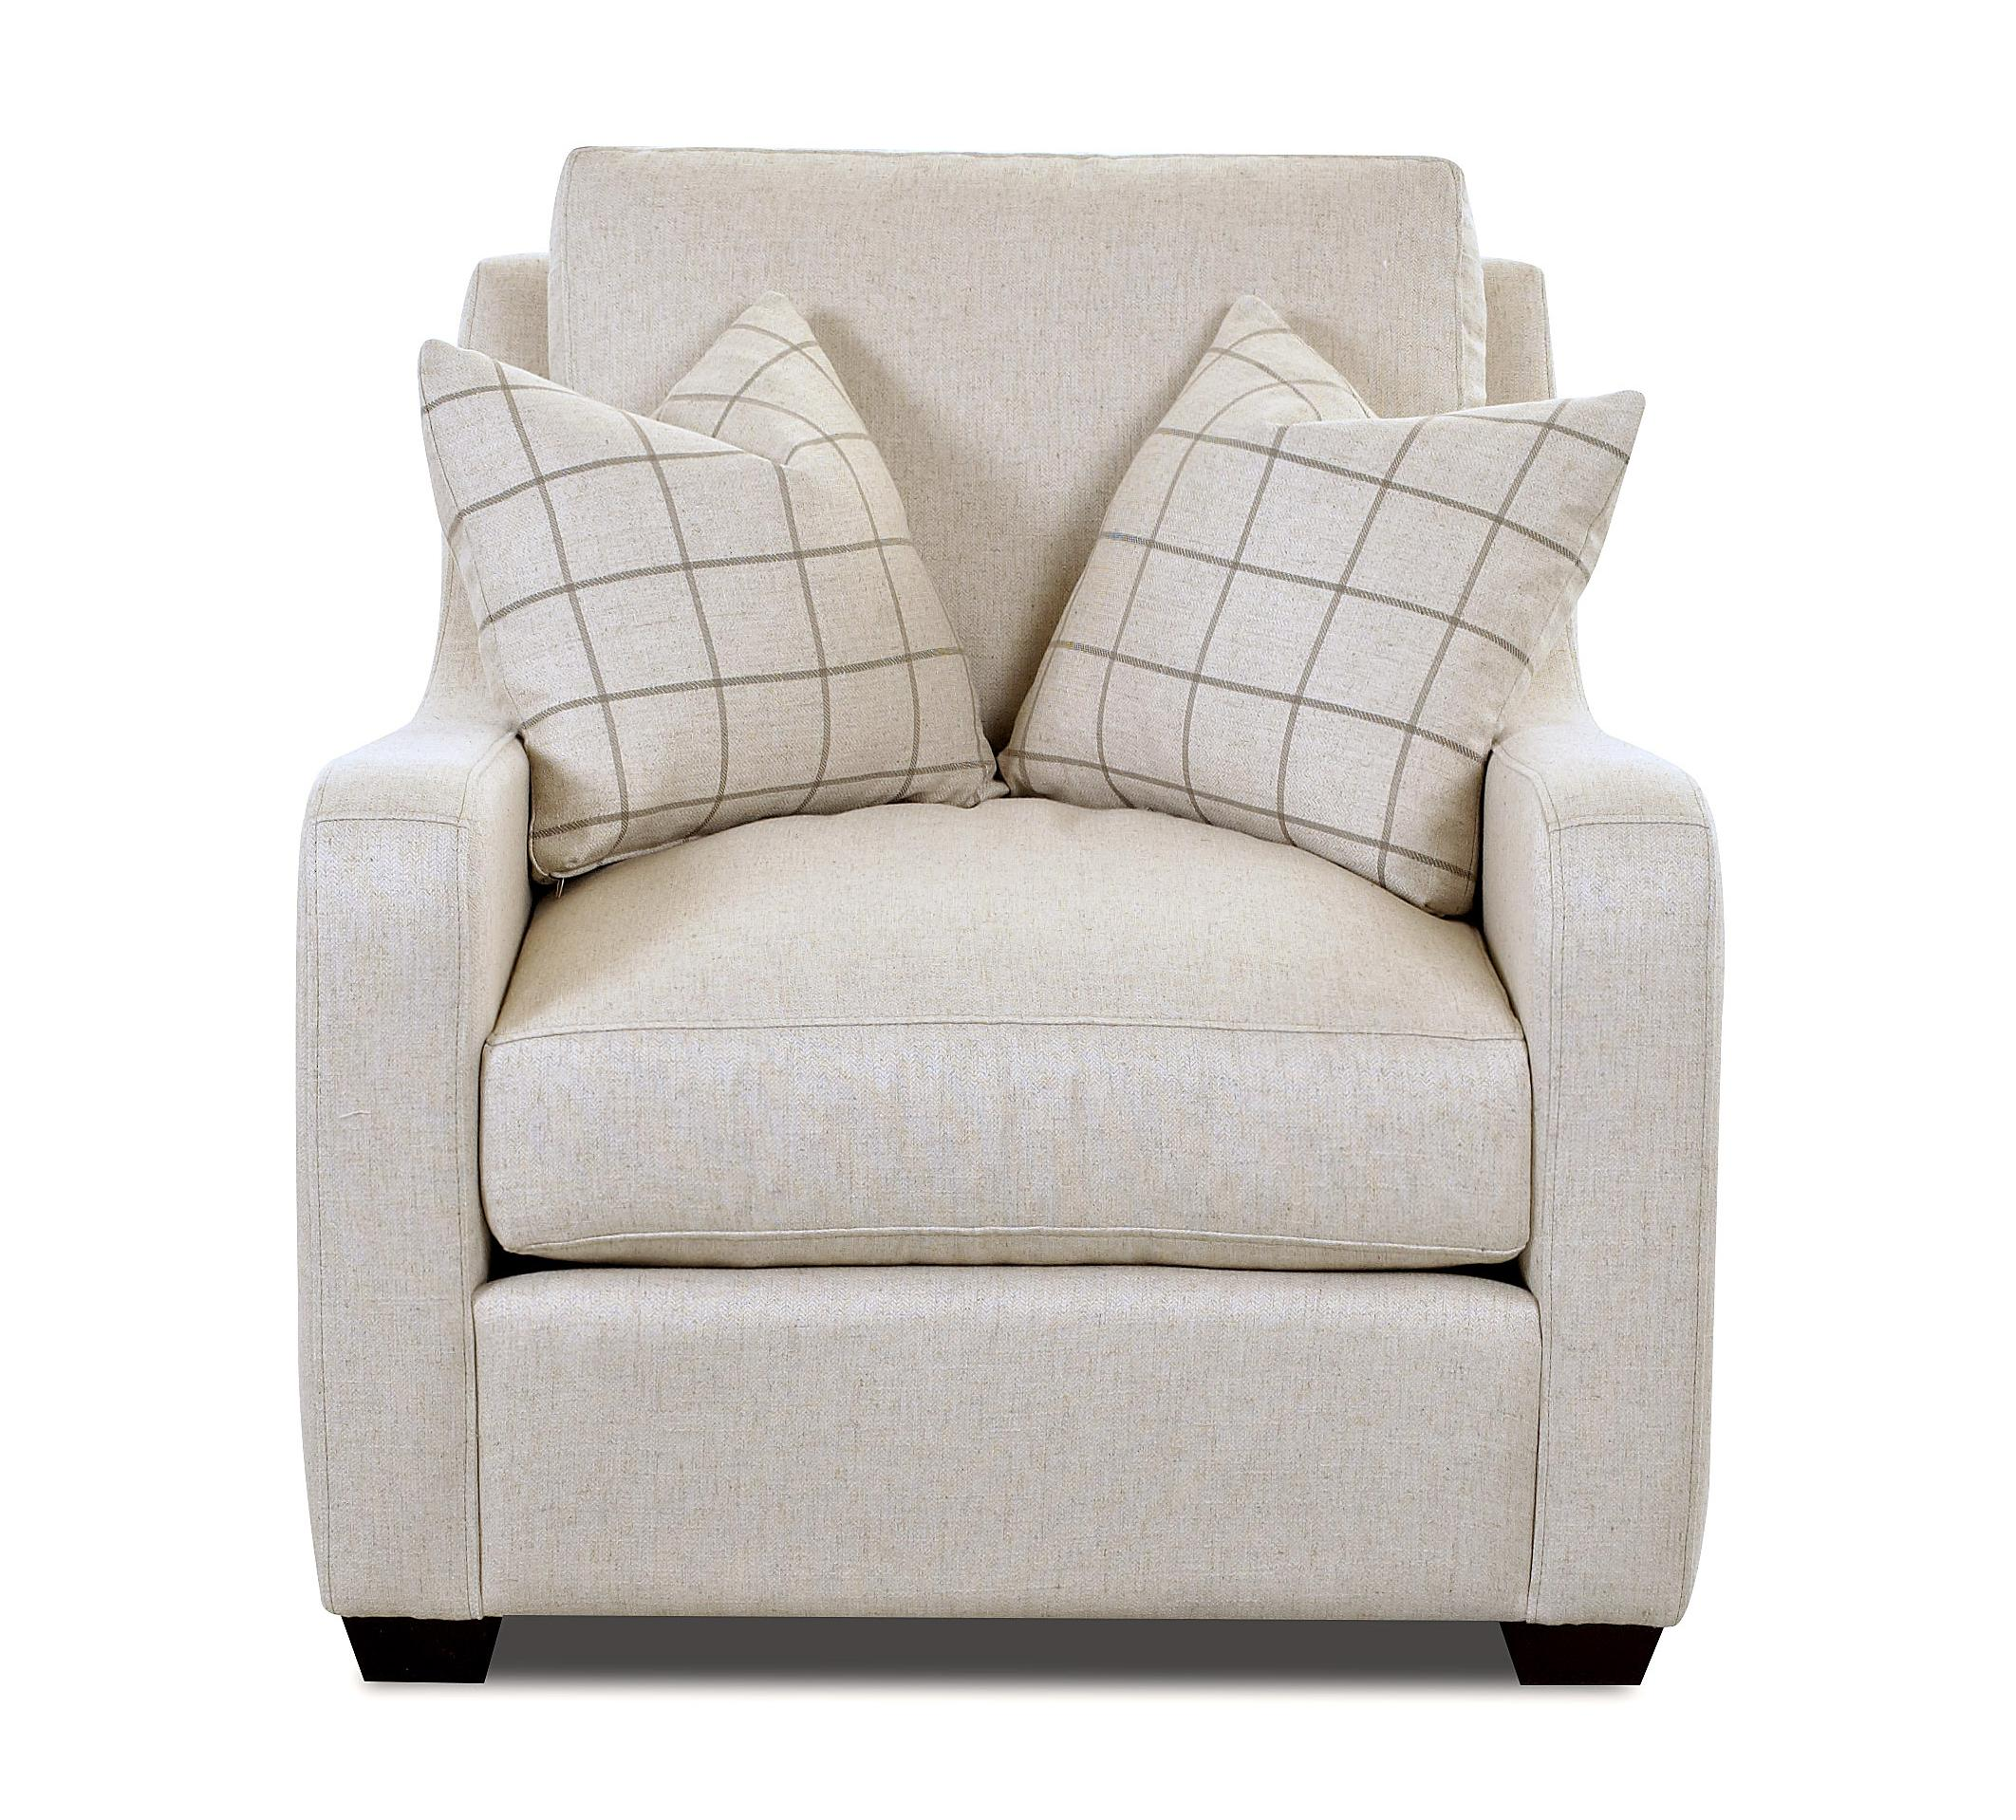 Transitional Big Chair